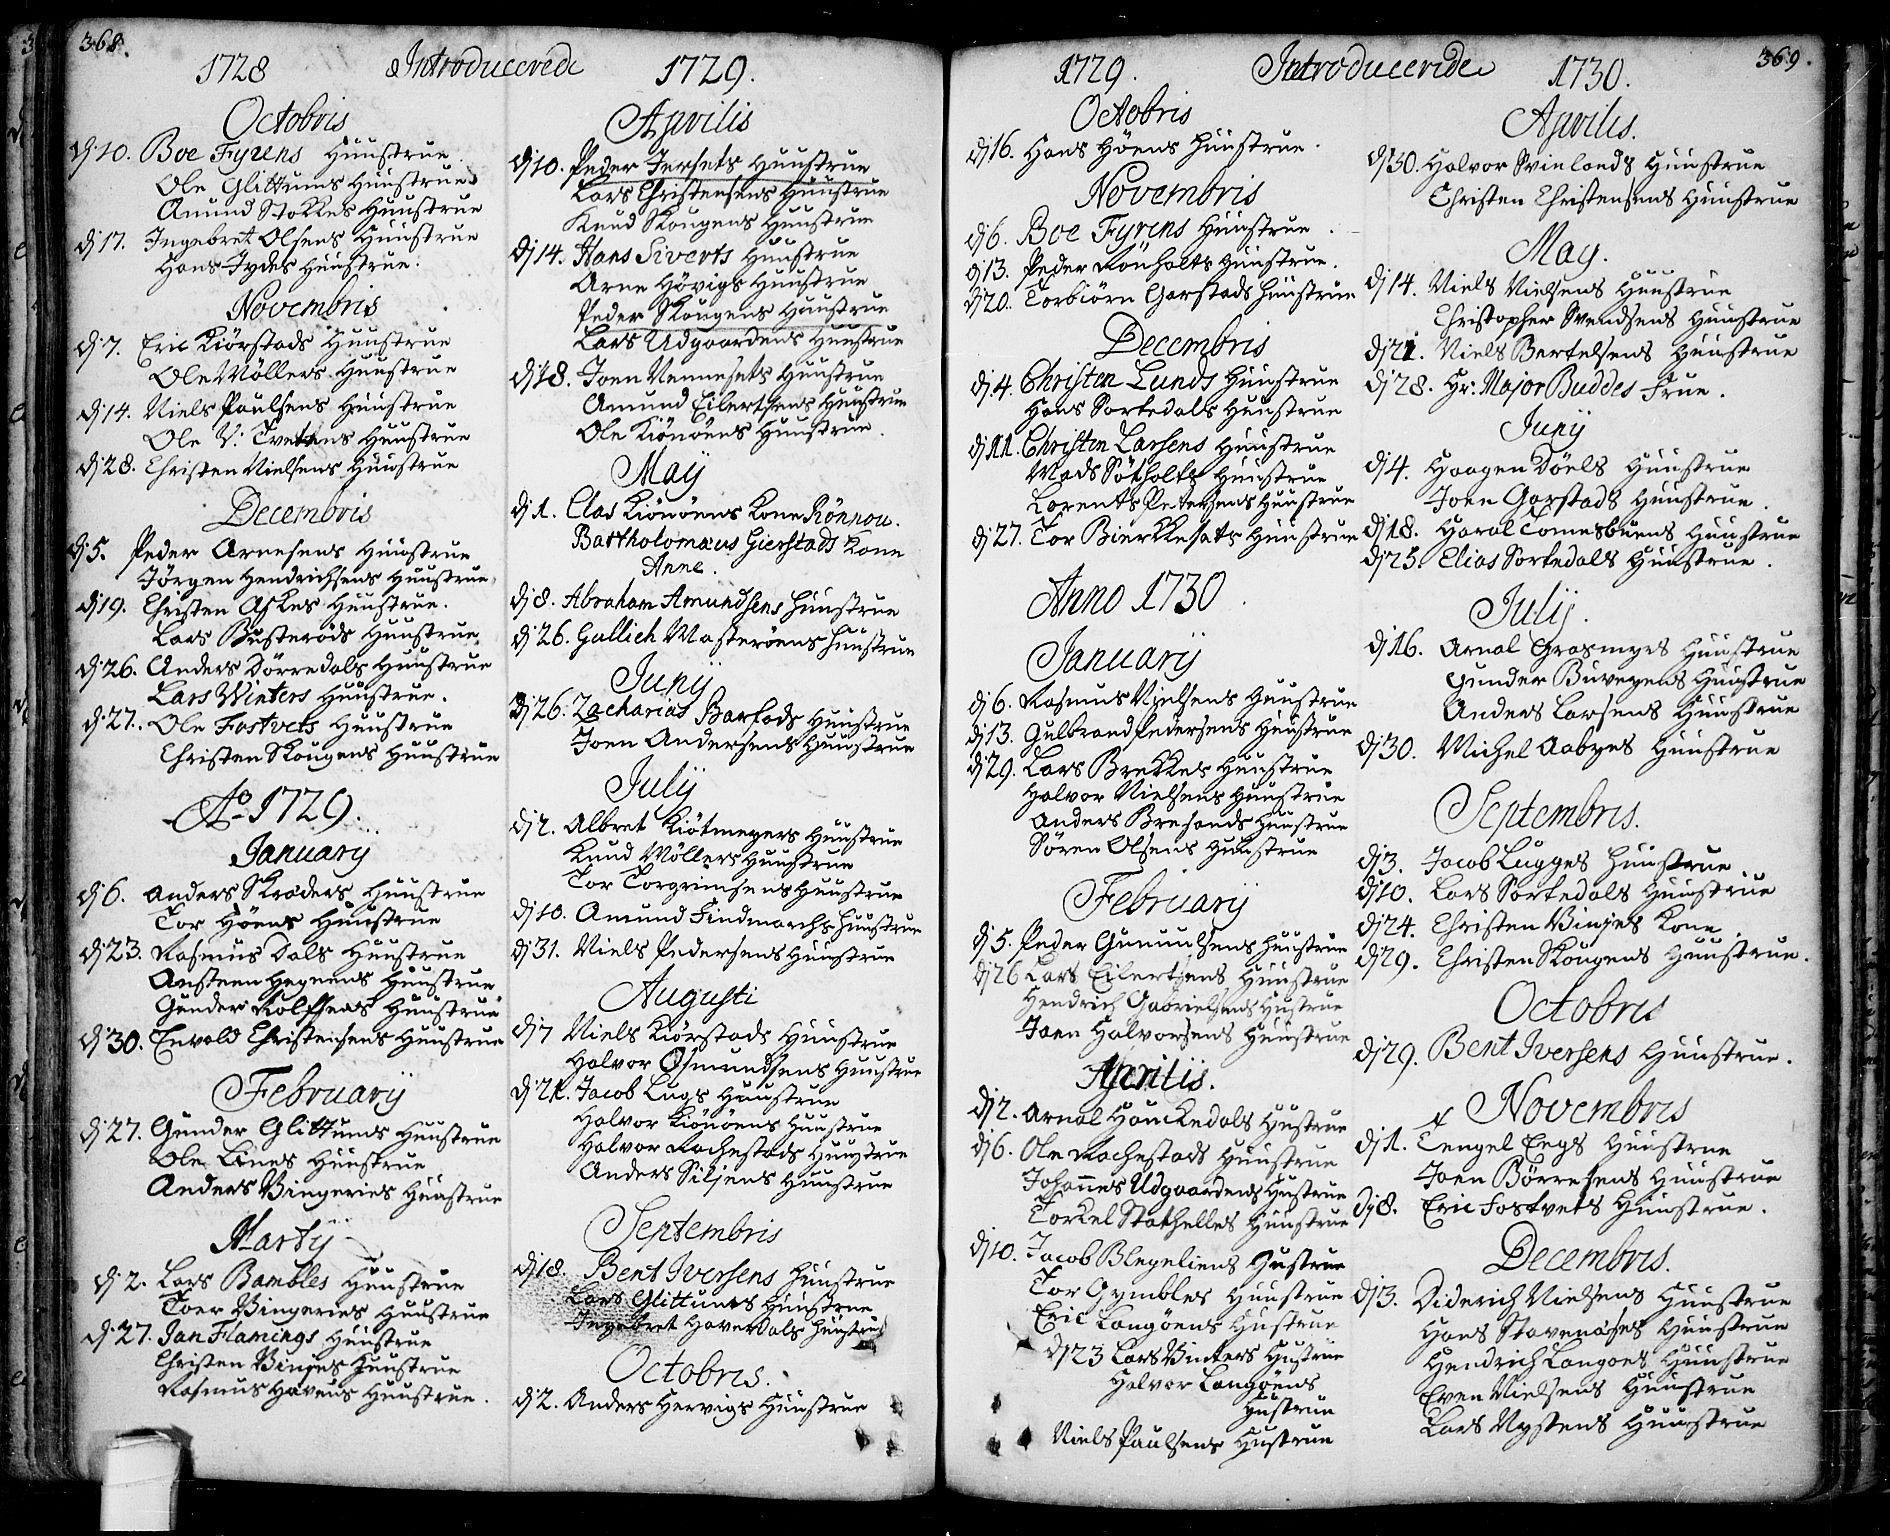 SAKO, Bamble kirkebøker, F/Fa/L0001: Ministerialbok nr. I 1, 1702-1774, s. 368-369